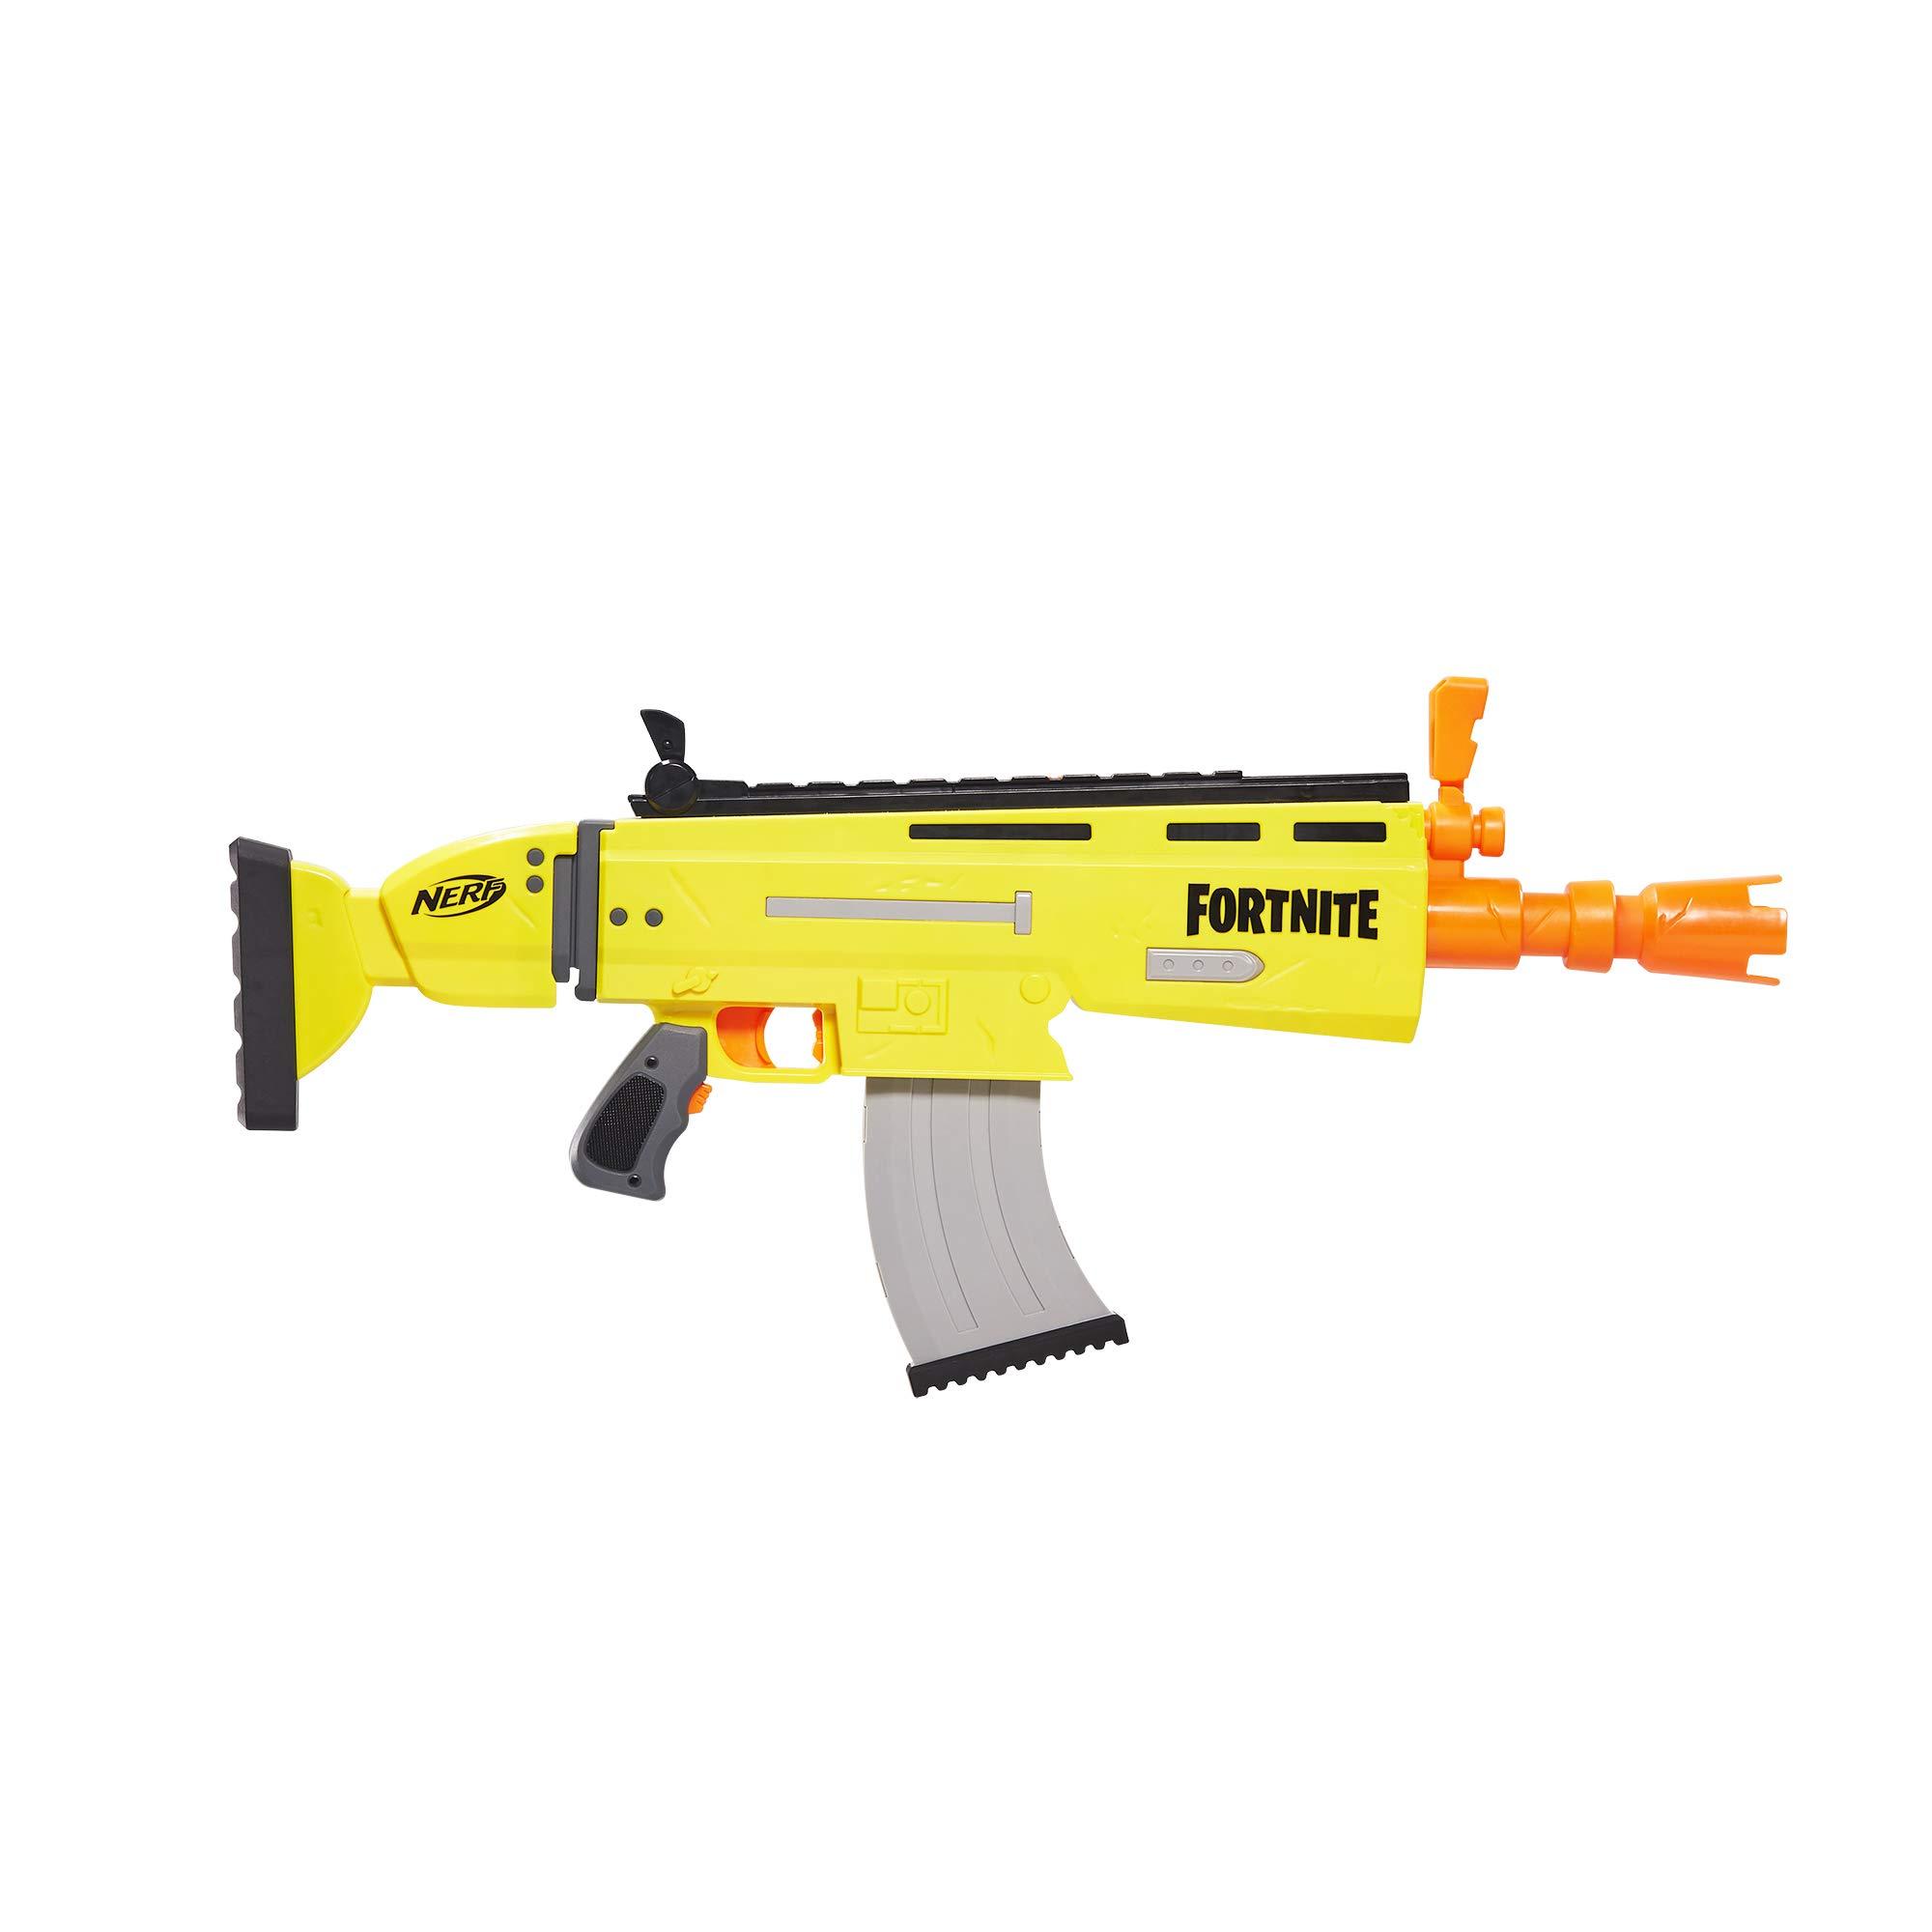 Buy Nerf Gun Now!